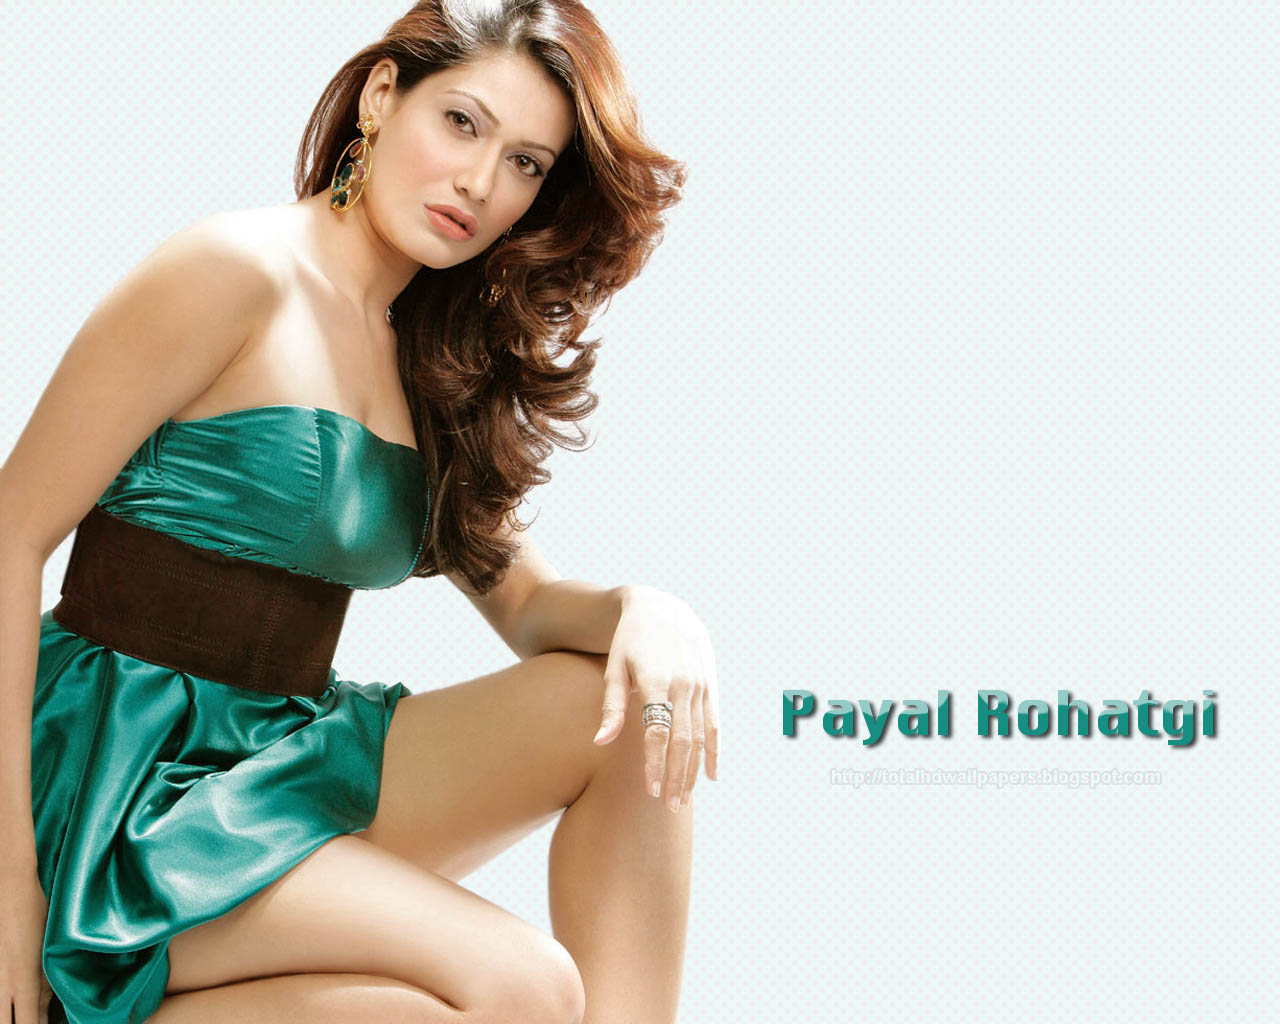 wallpapers hd : payal rohatgi hd wallpapers